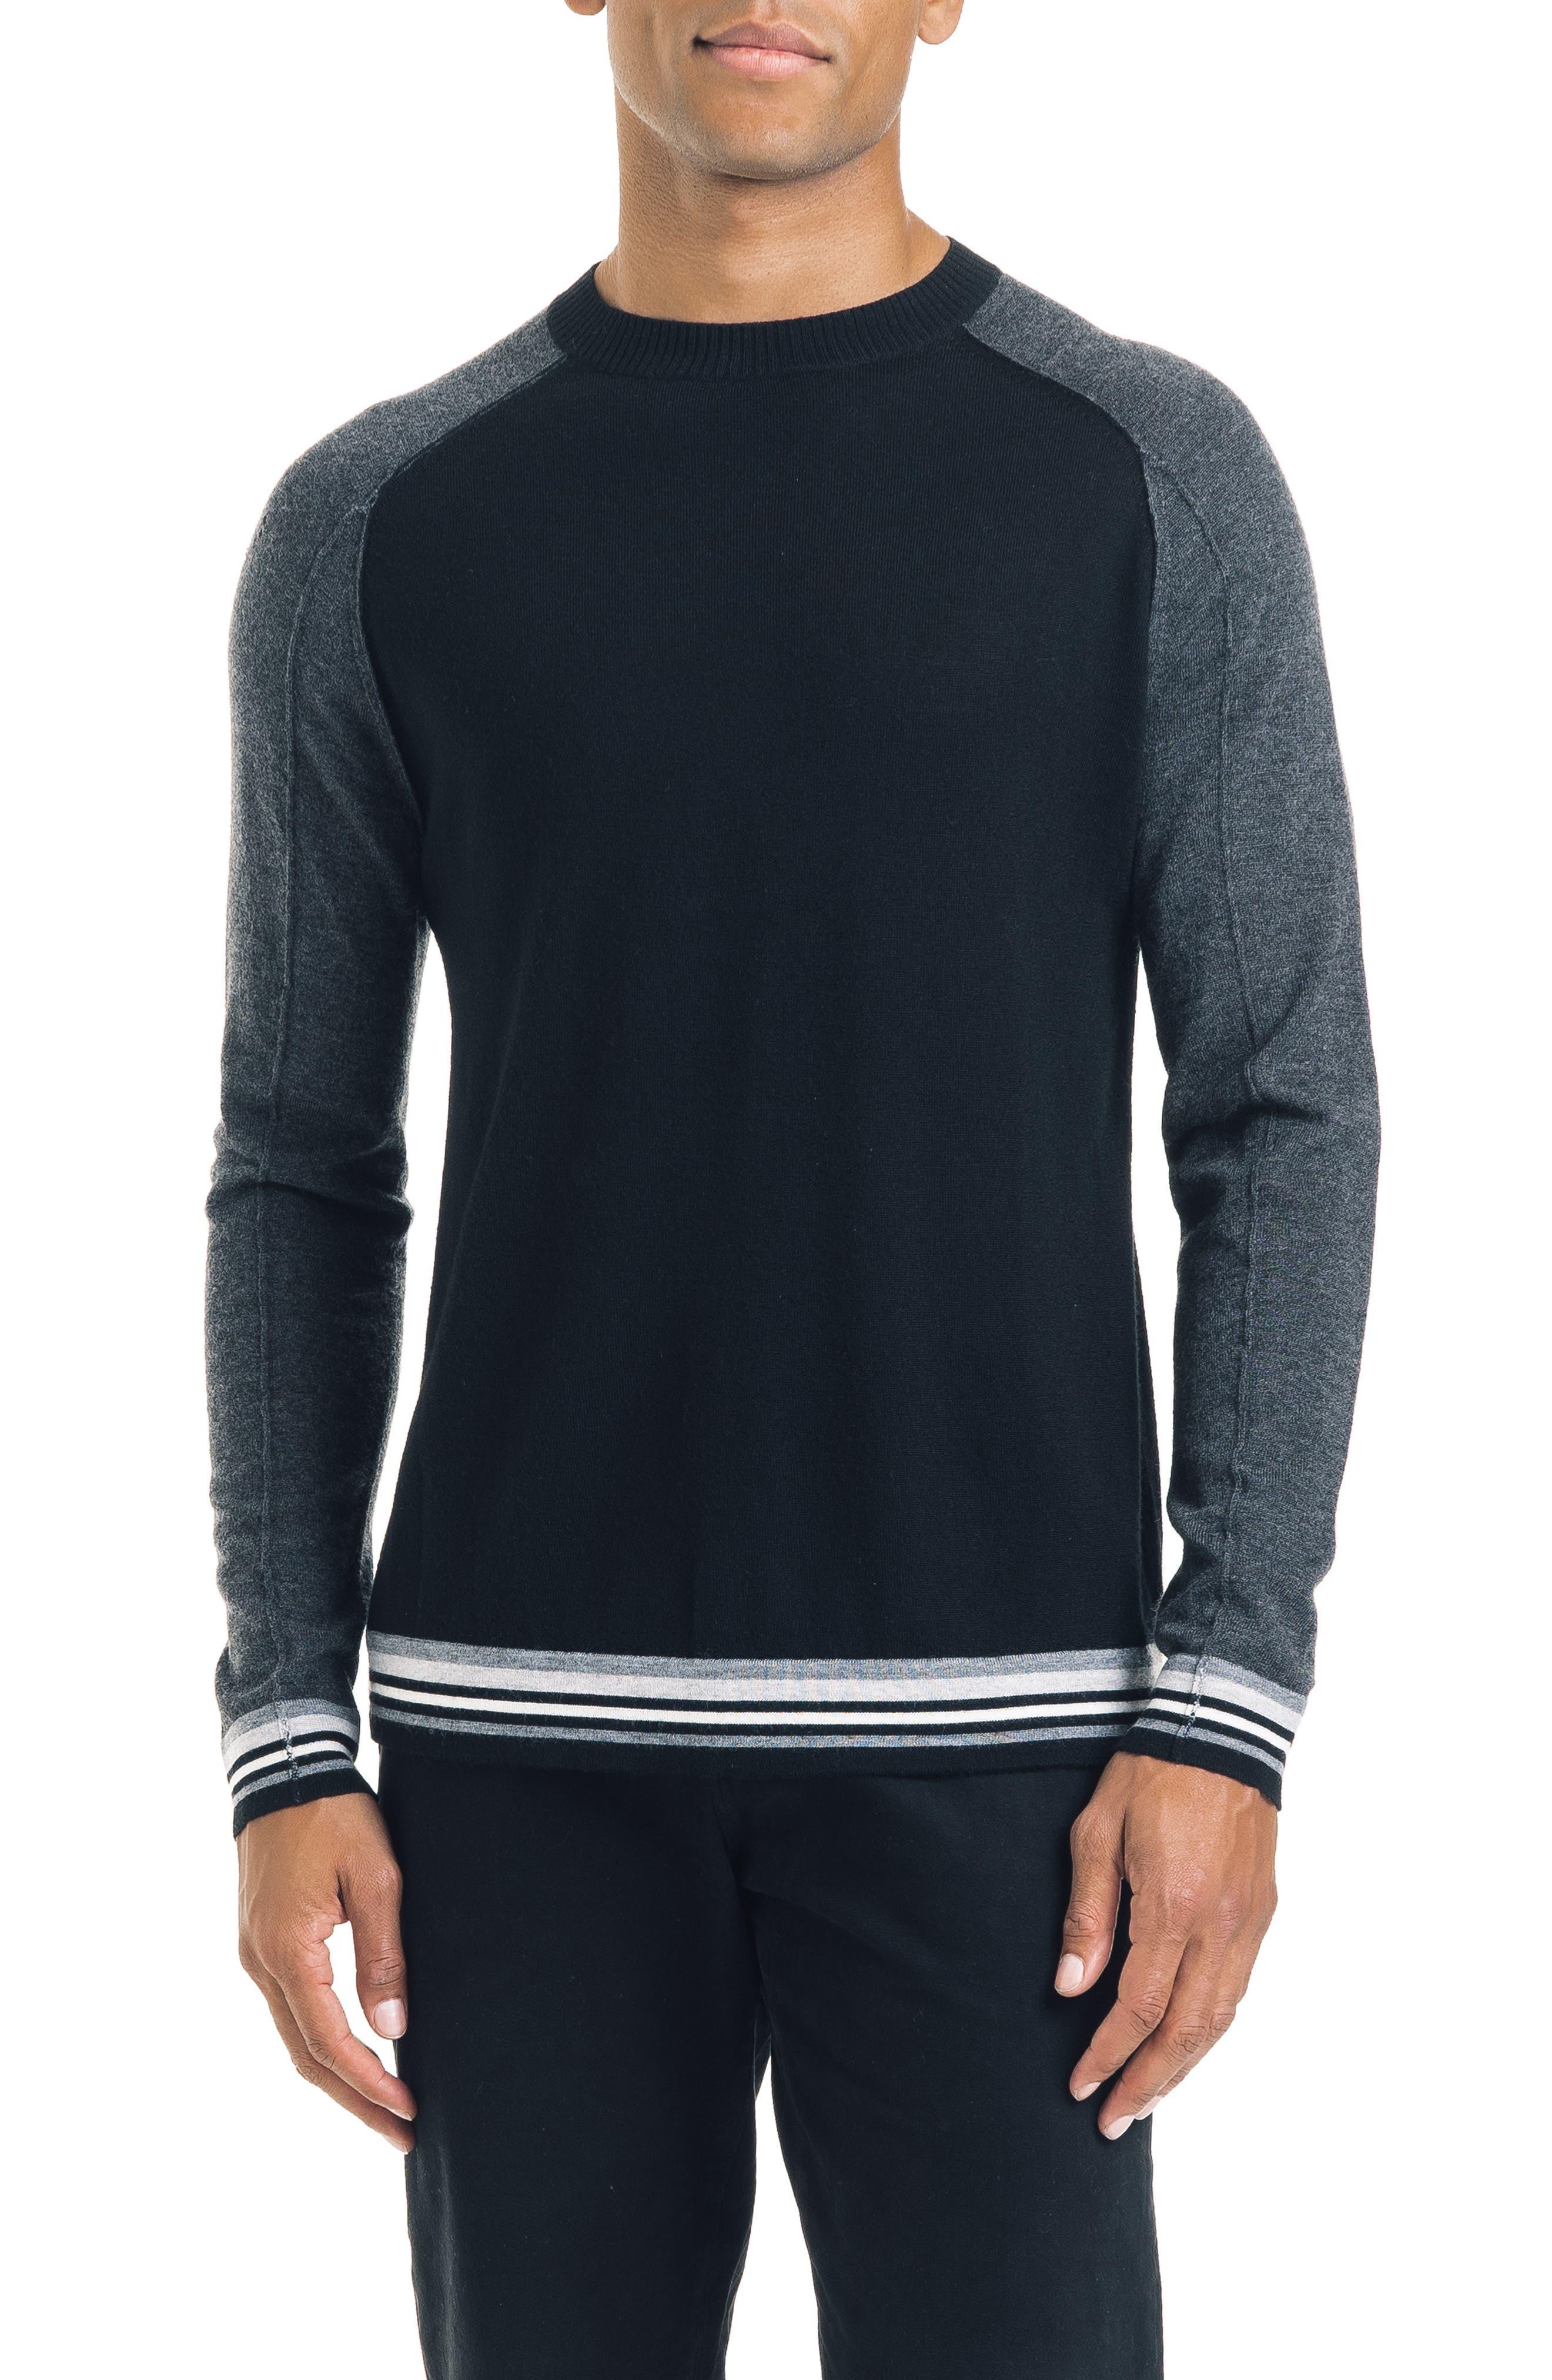 Mix Modern Slim Fit Wool Sweater,                         Main,                         color, BLACK